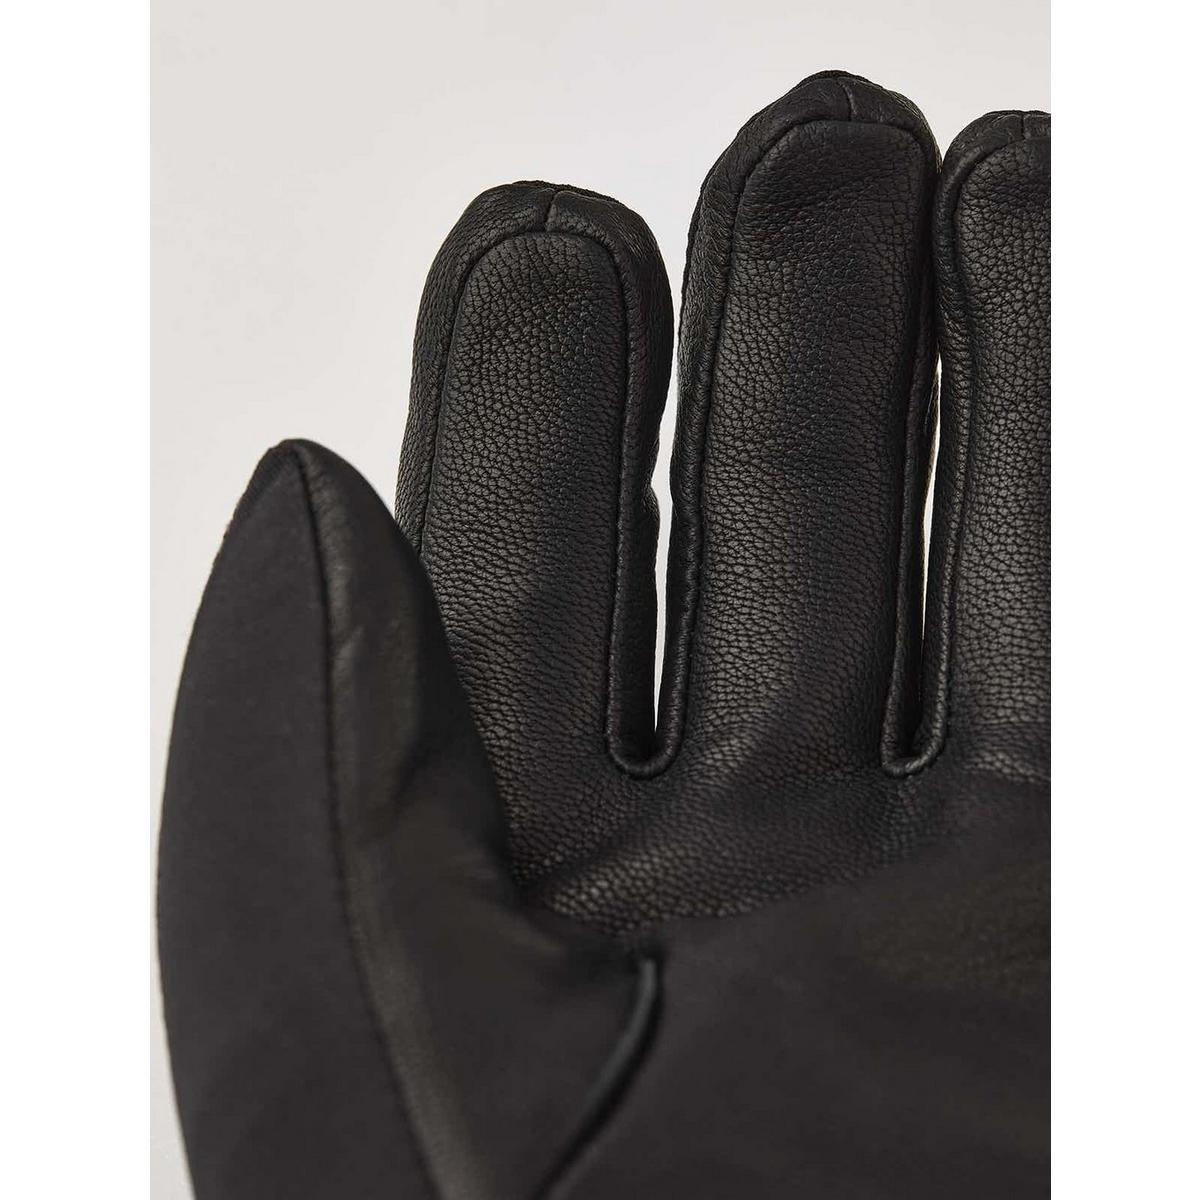 Hestra Men's Army Leather Blizzard Glove - Black